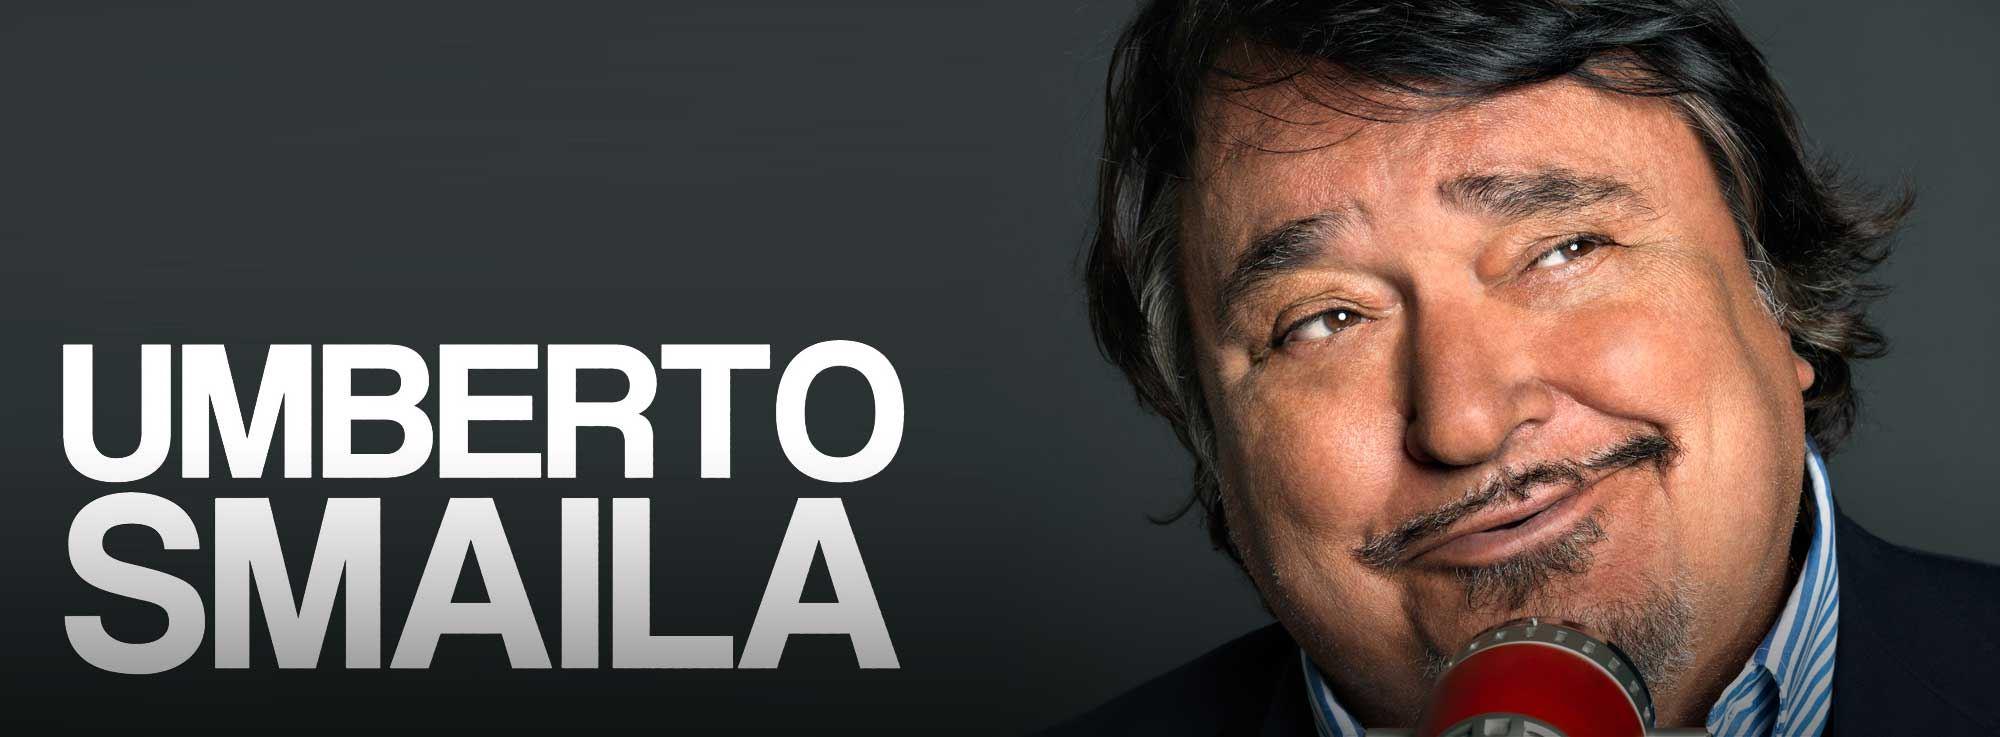 Trani: Umberto Smaila ospite a La Lampara